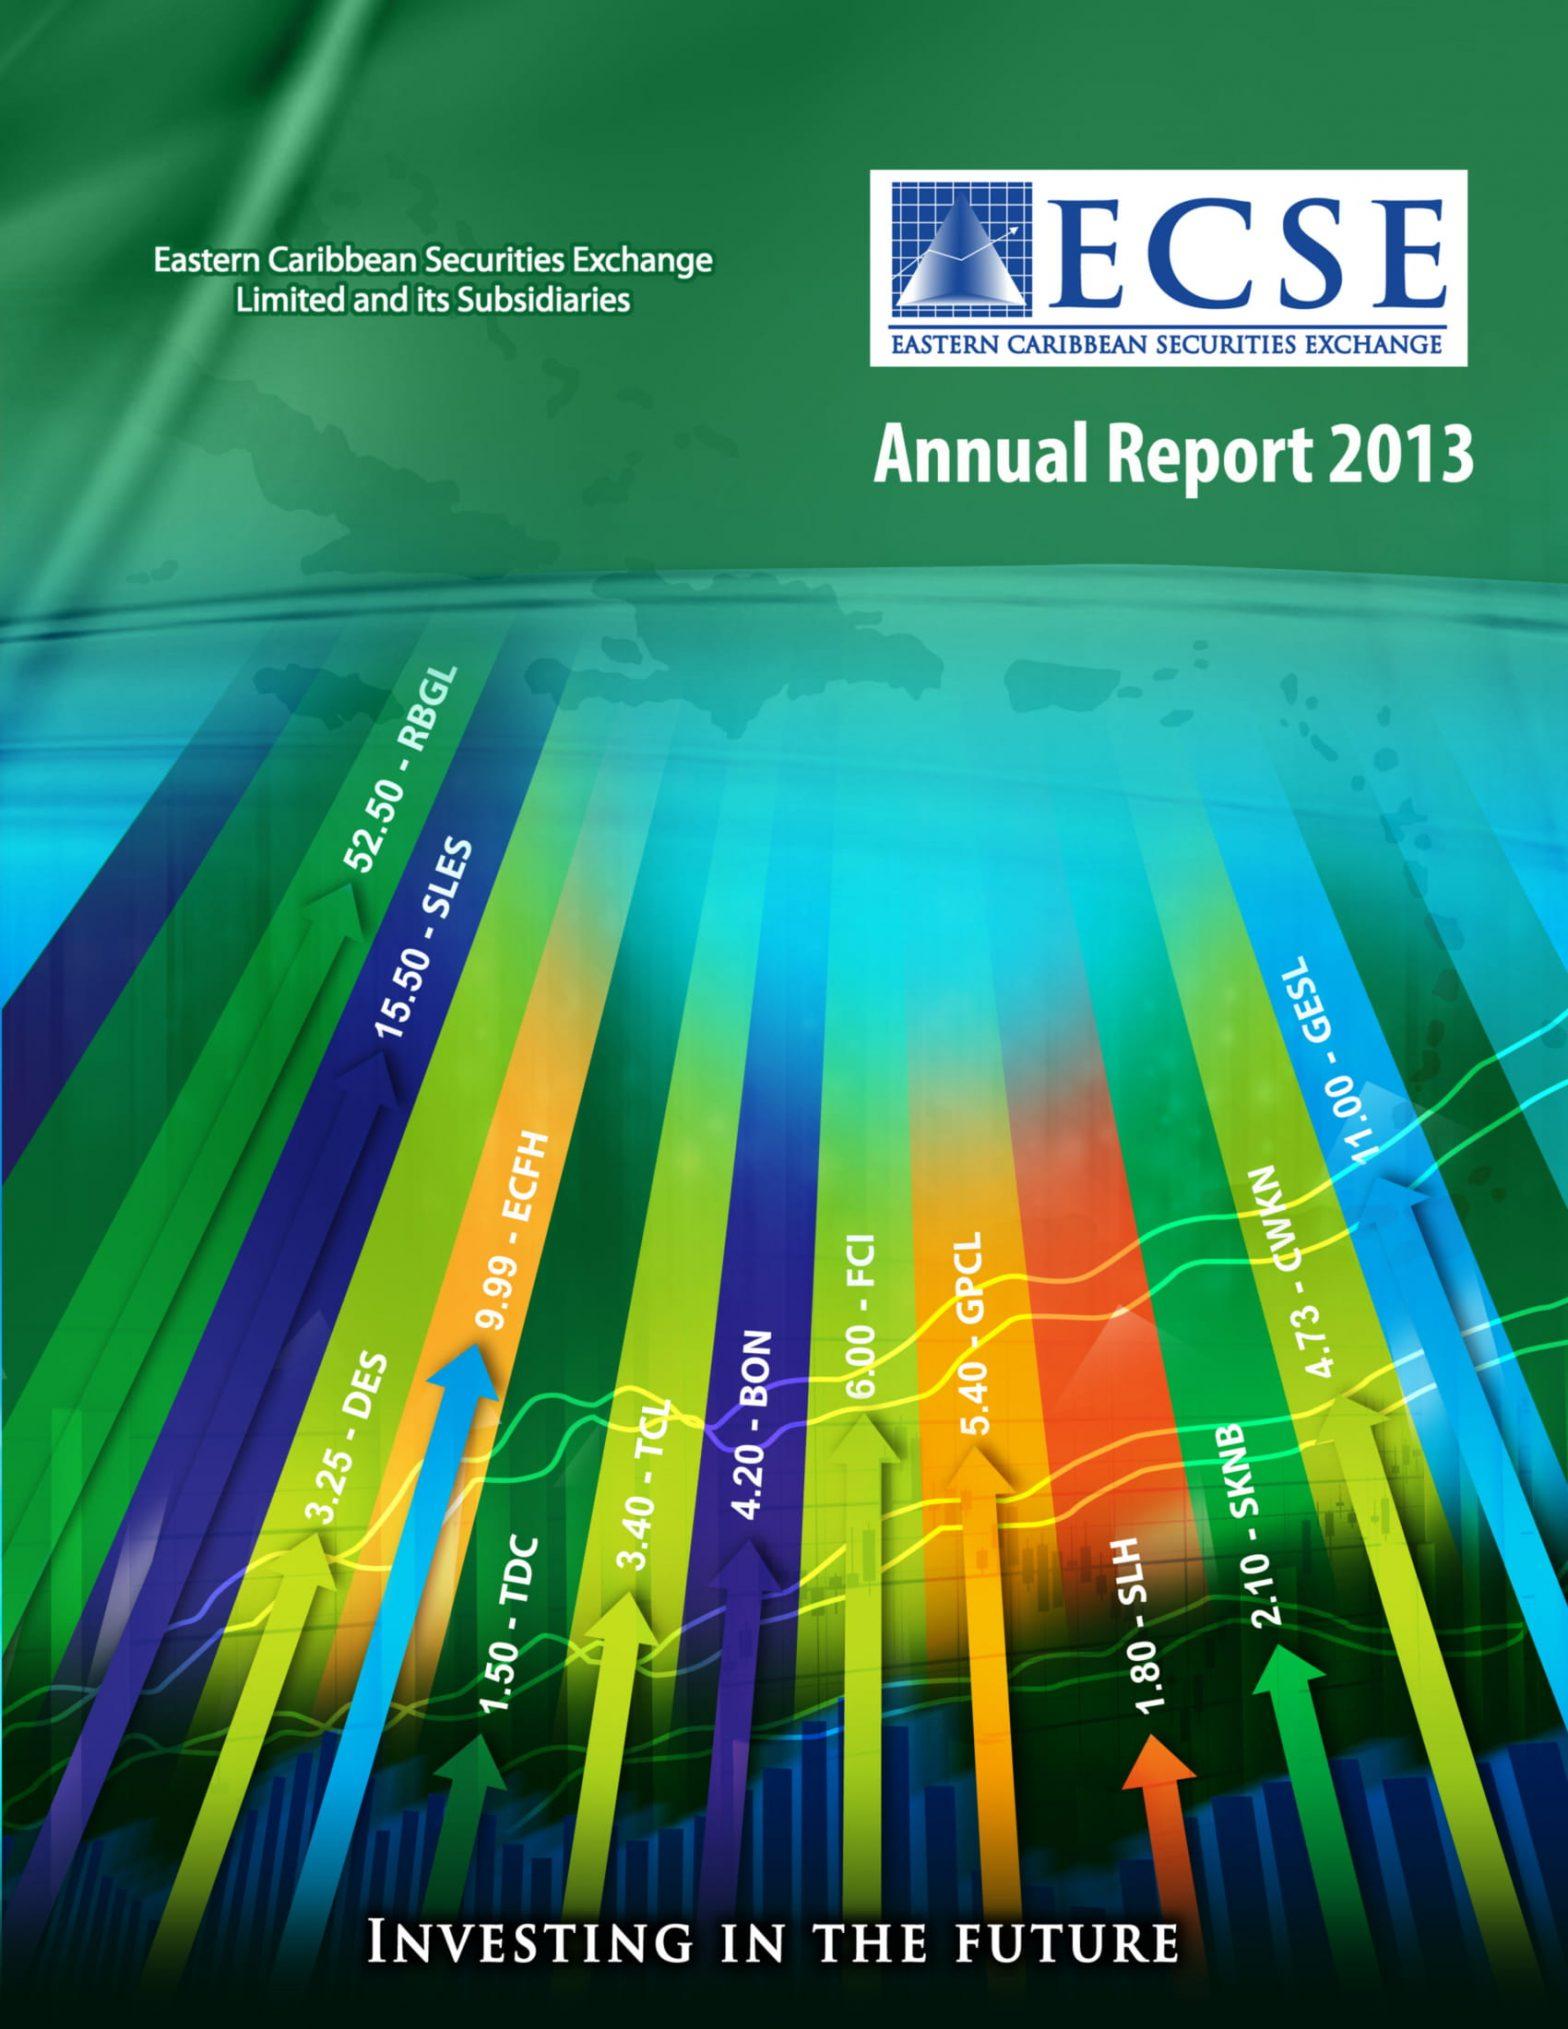 ECSE Annual Report 2013